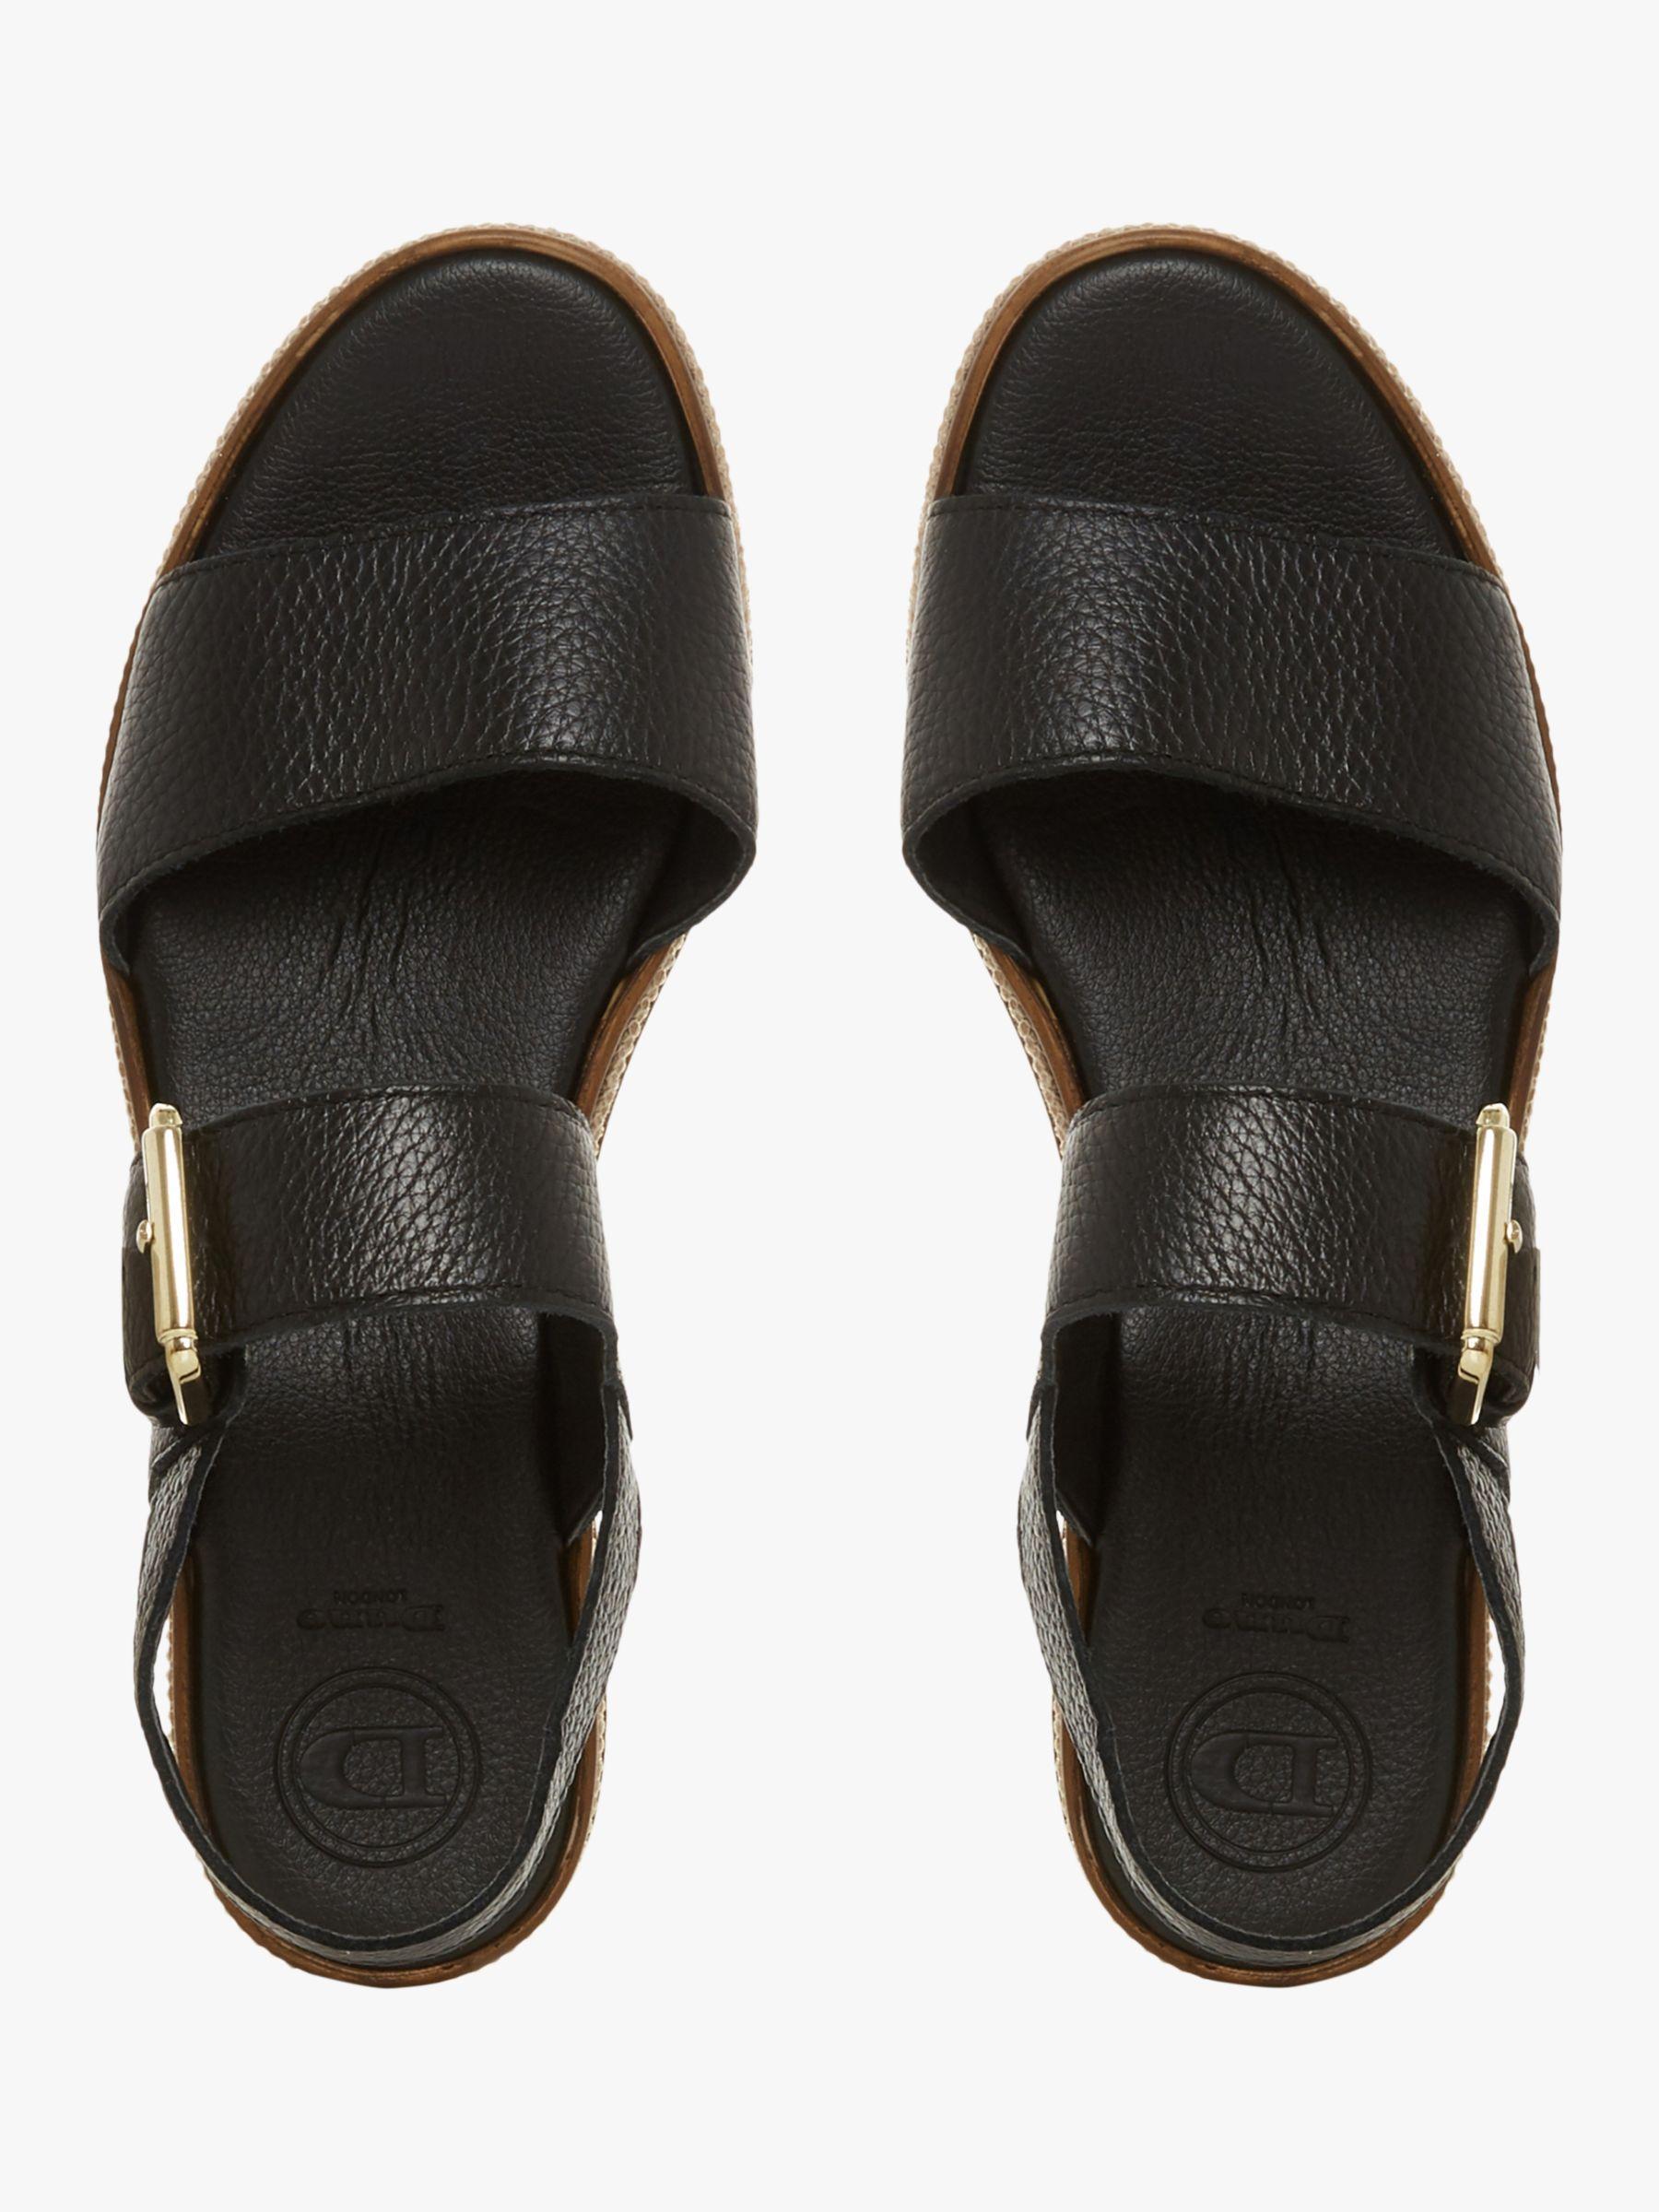 5a8d40f8b1e Dune Kaze Espadrille Flatform Sandals in Black - Lyst